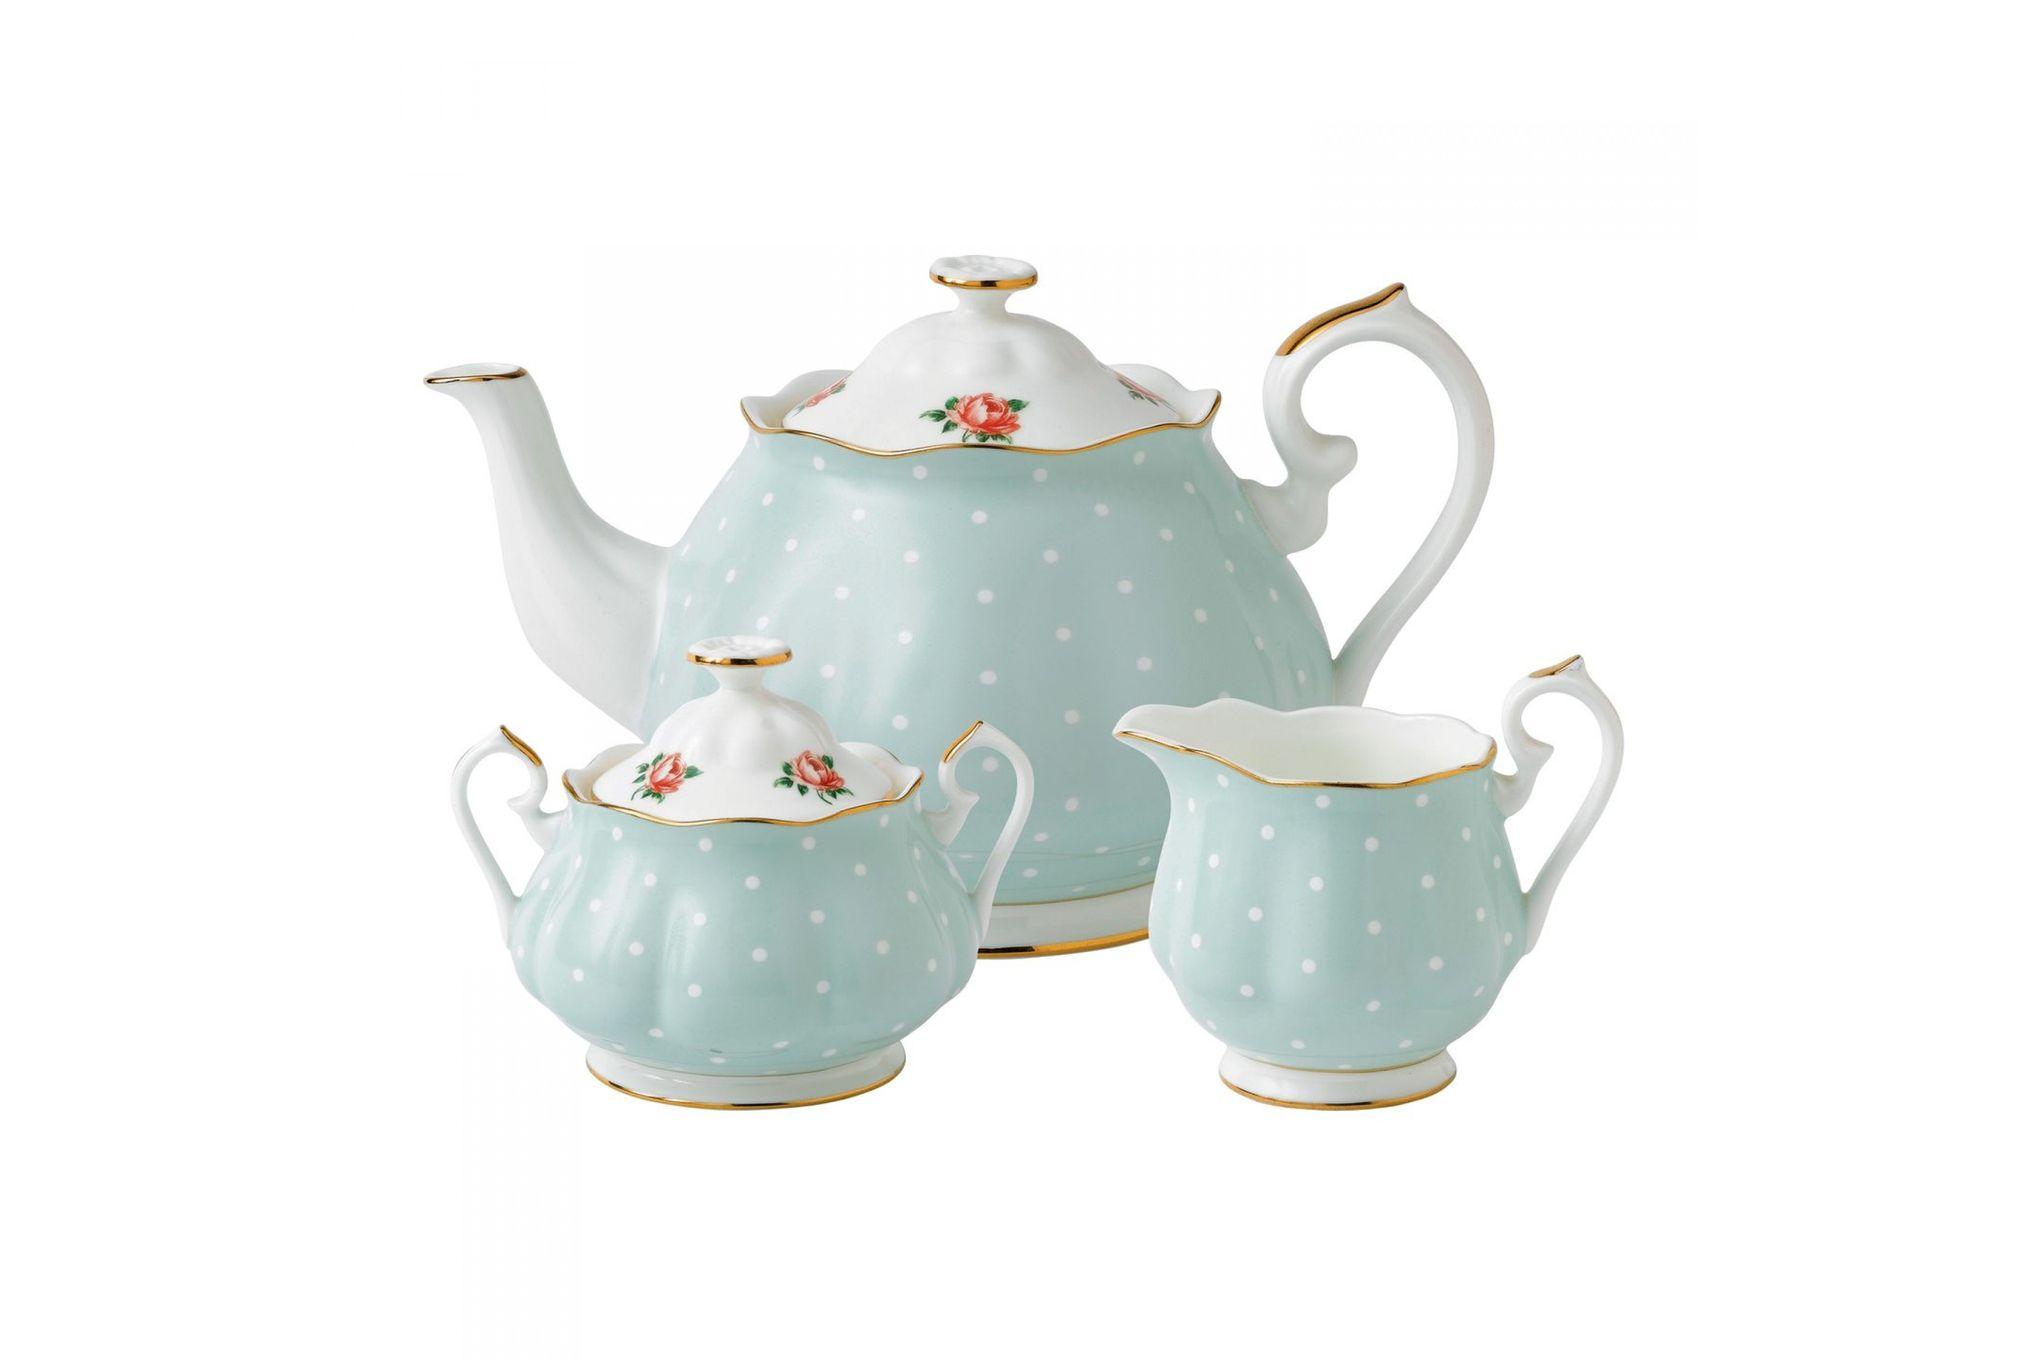 Royal Albert Polka Rose 3 Piece Tea set Teapot, Sugar Bowl and Creamer - Polka Rose thumb 1